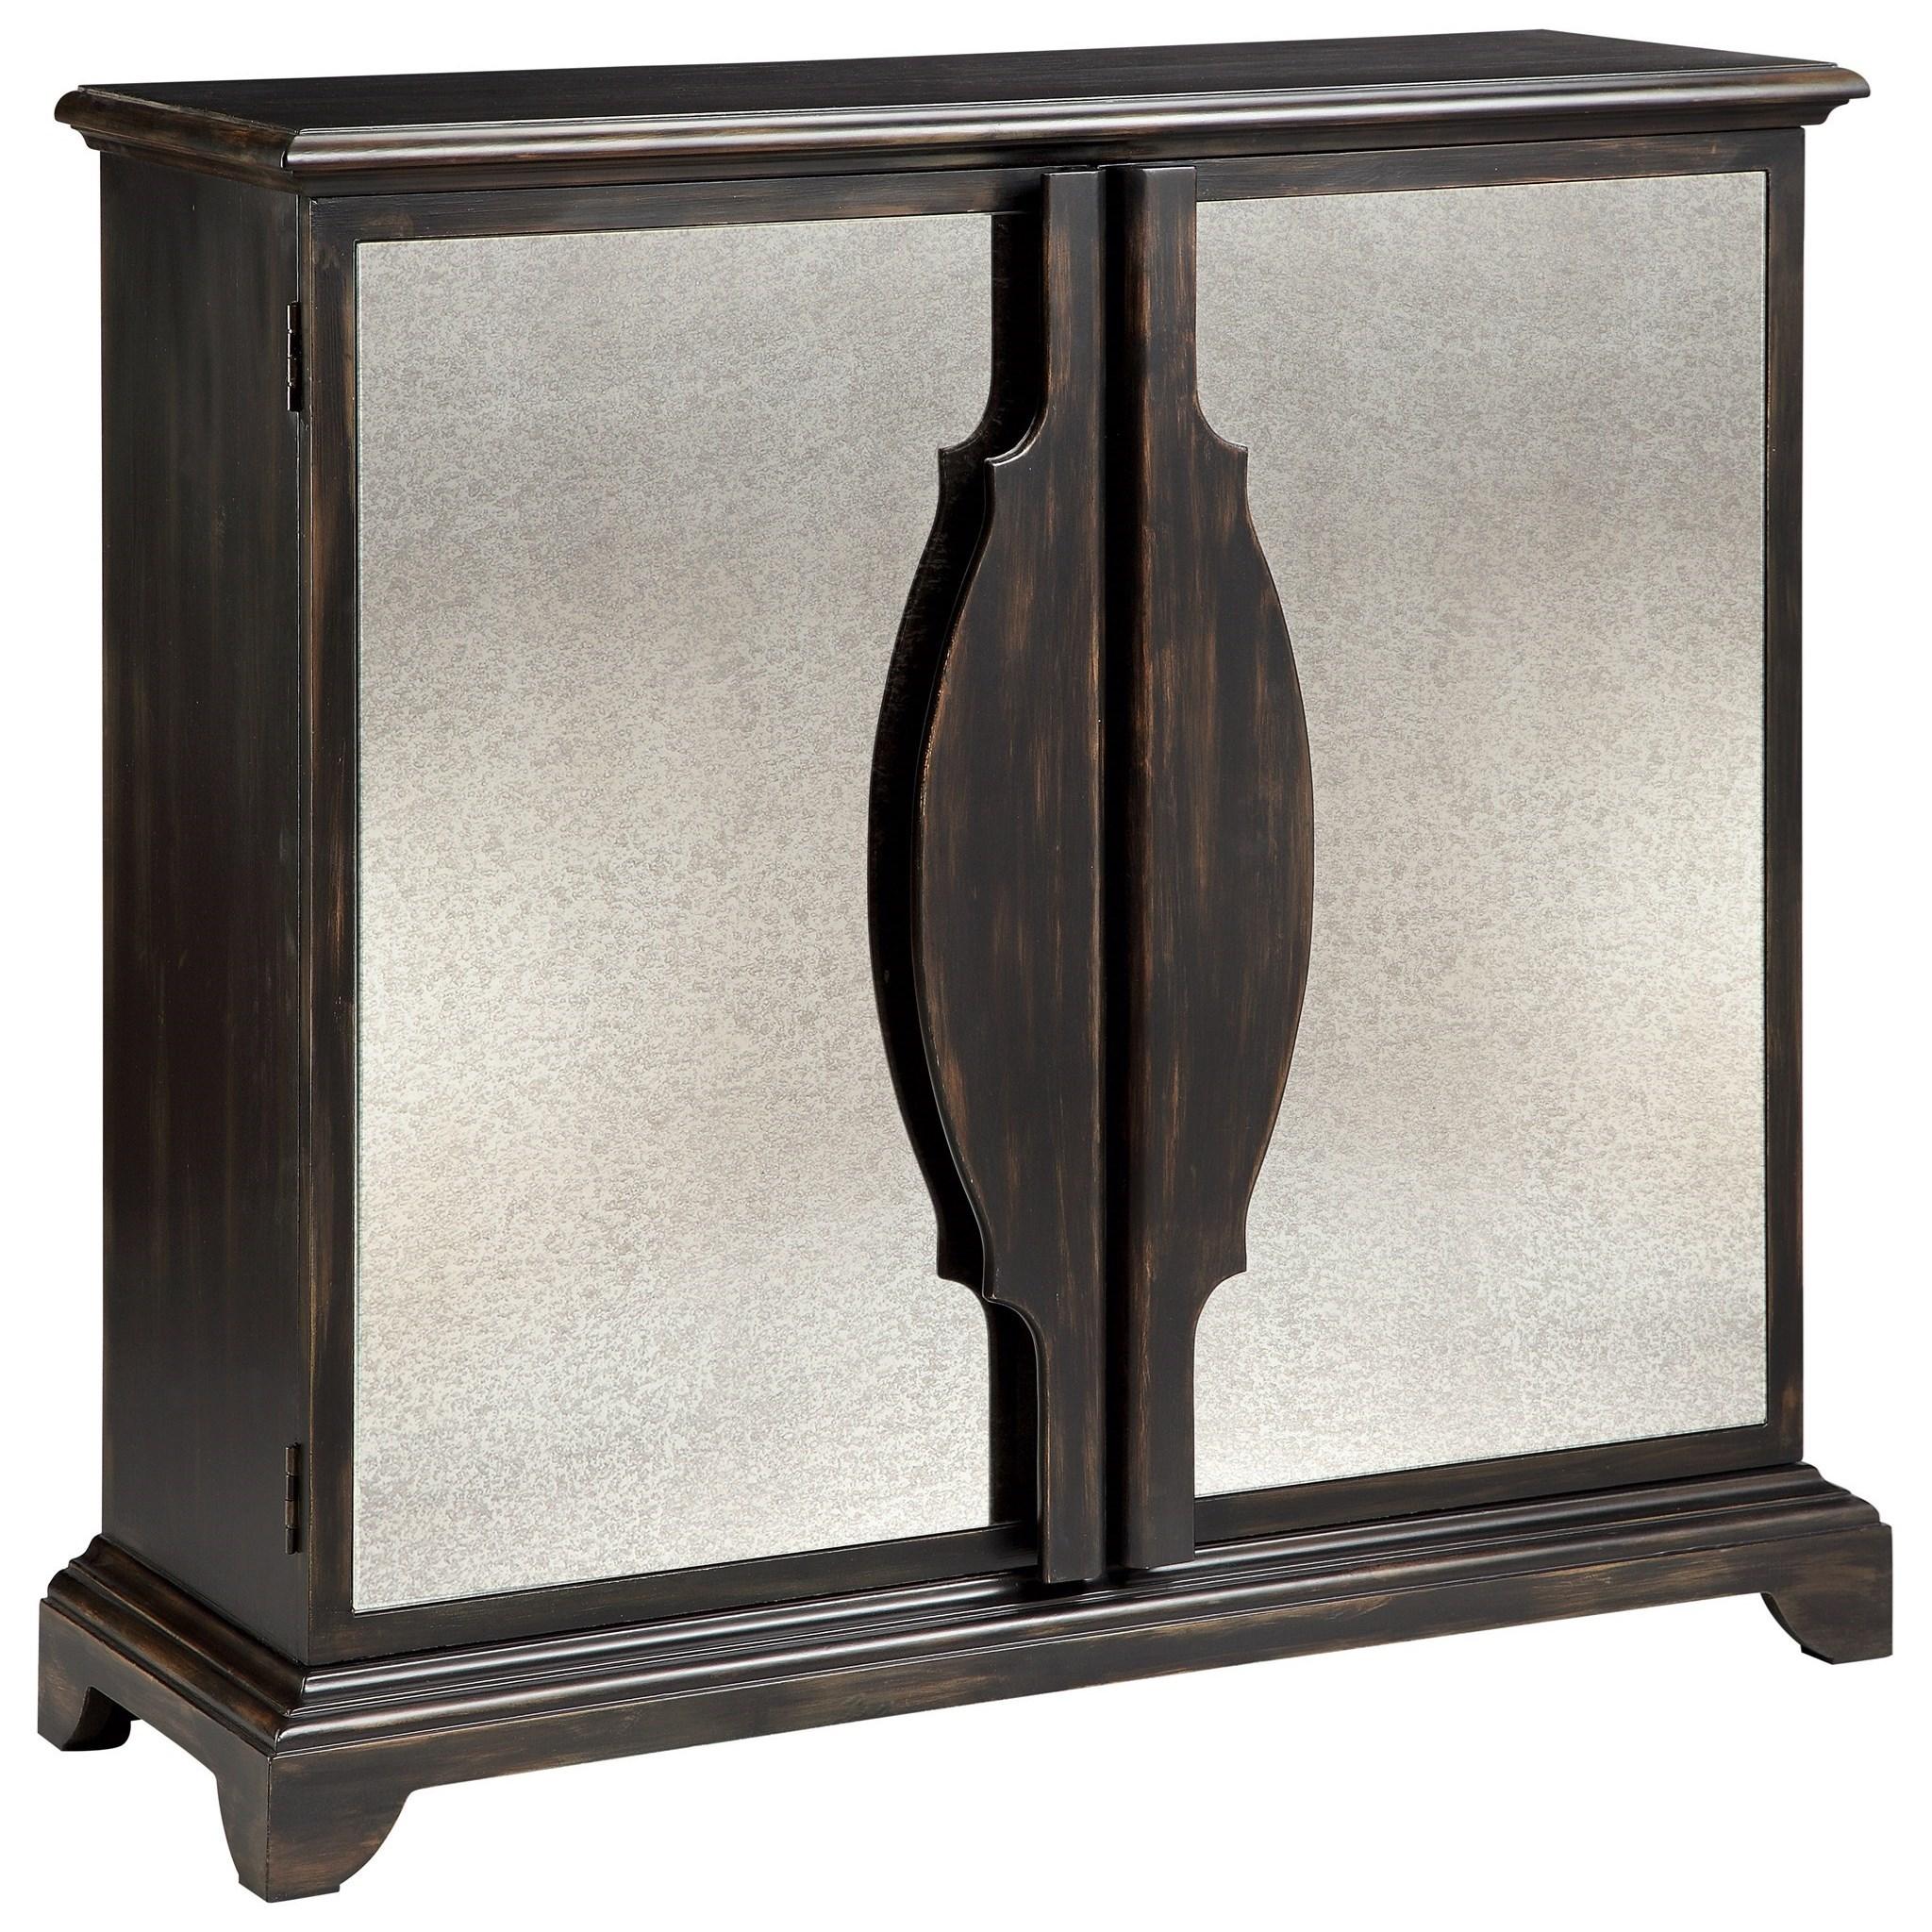 Cabinets Wine Cabinet by Stein World at Westrich Furniture & Appliances